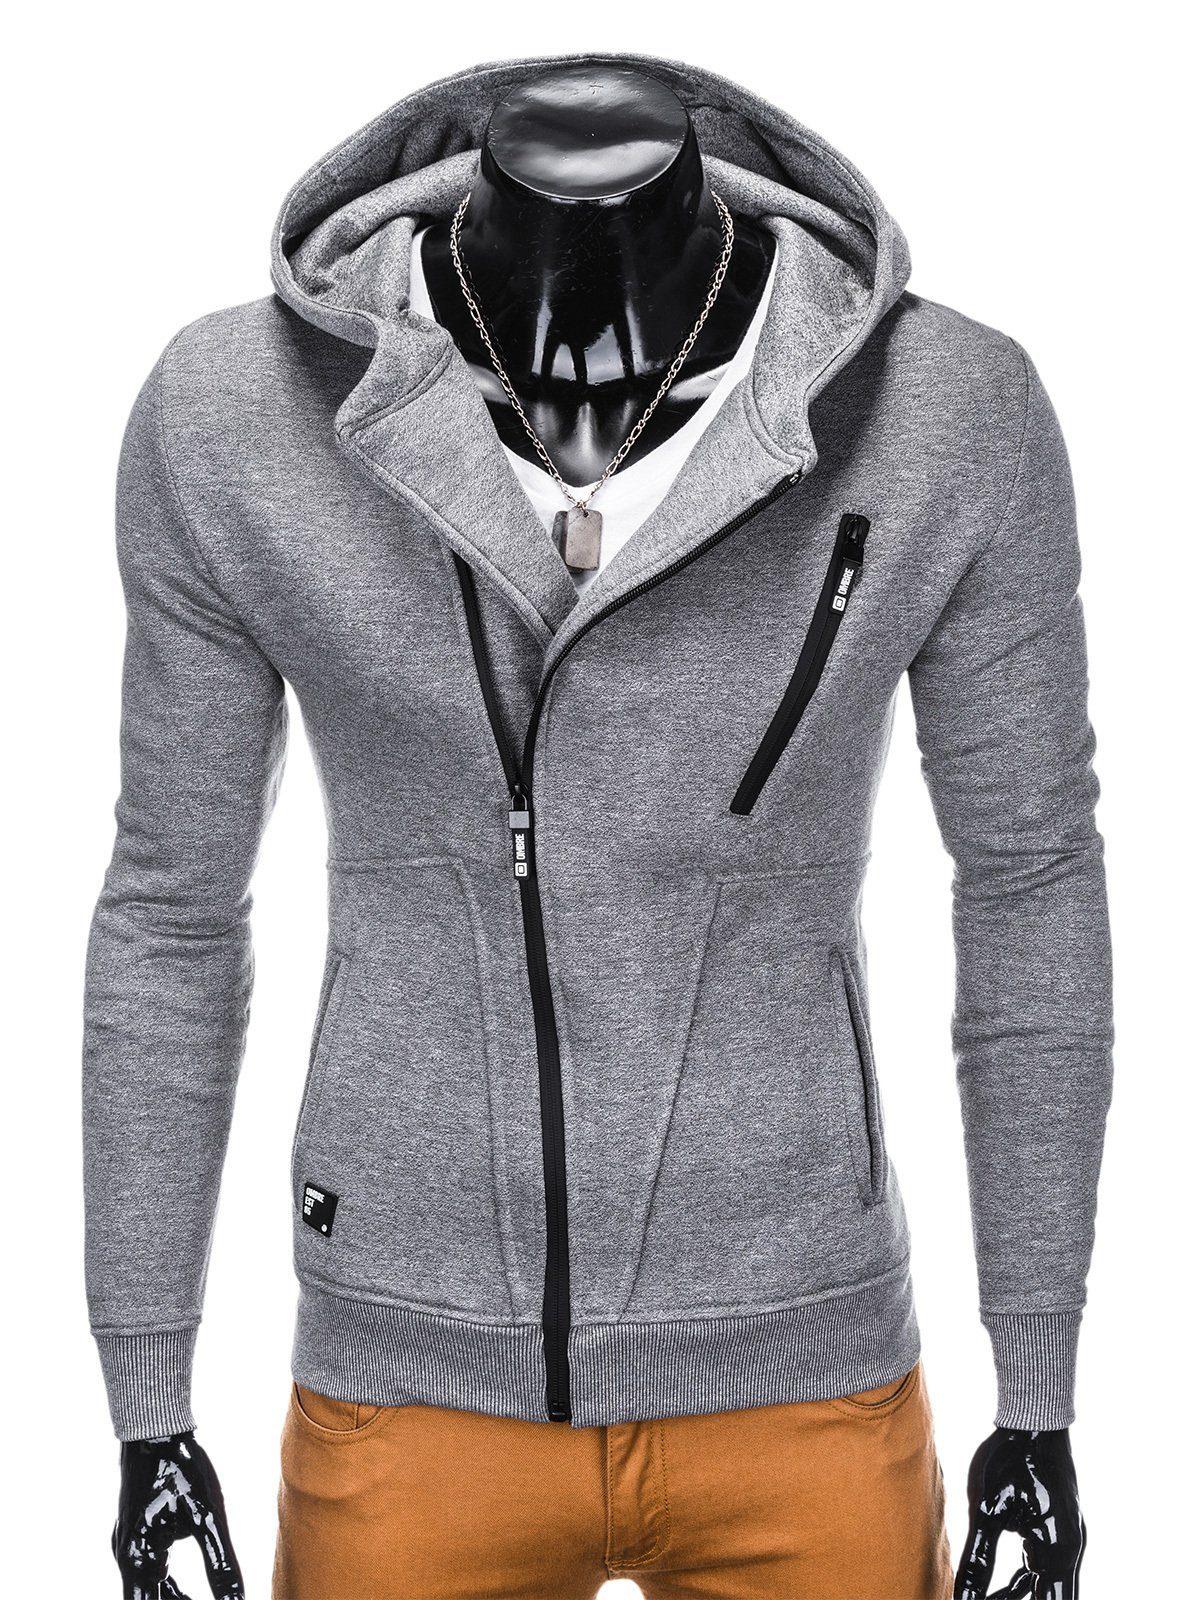 OMBRE Kapuzensweatjacke | Bekleidung > Sweatshirts & -jacken | Grau | Jeans | Ombre